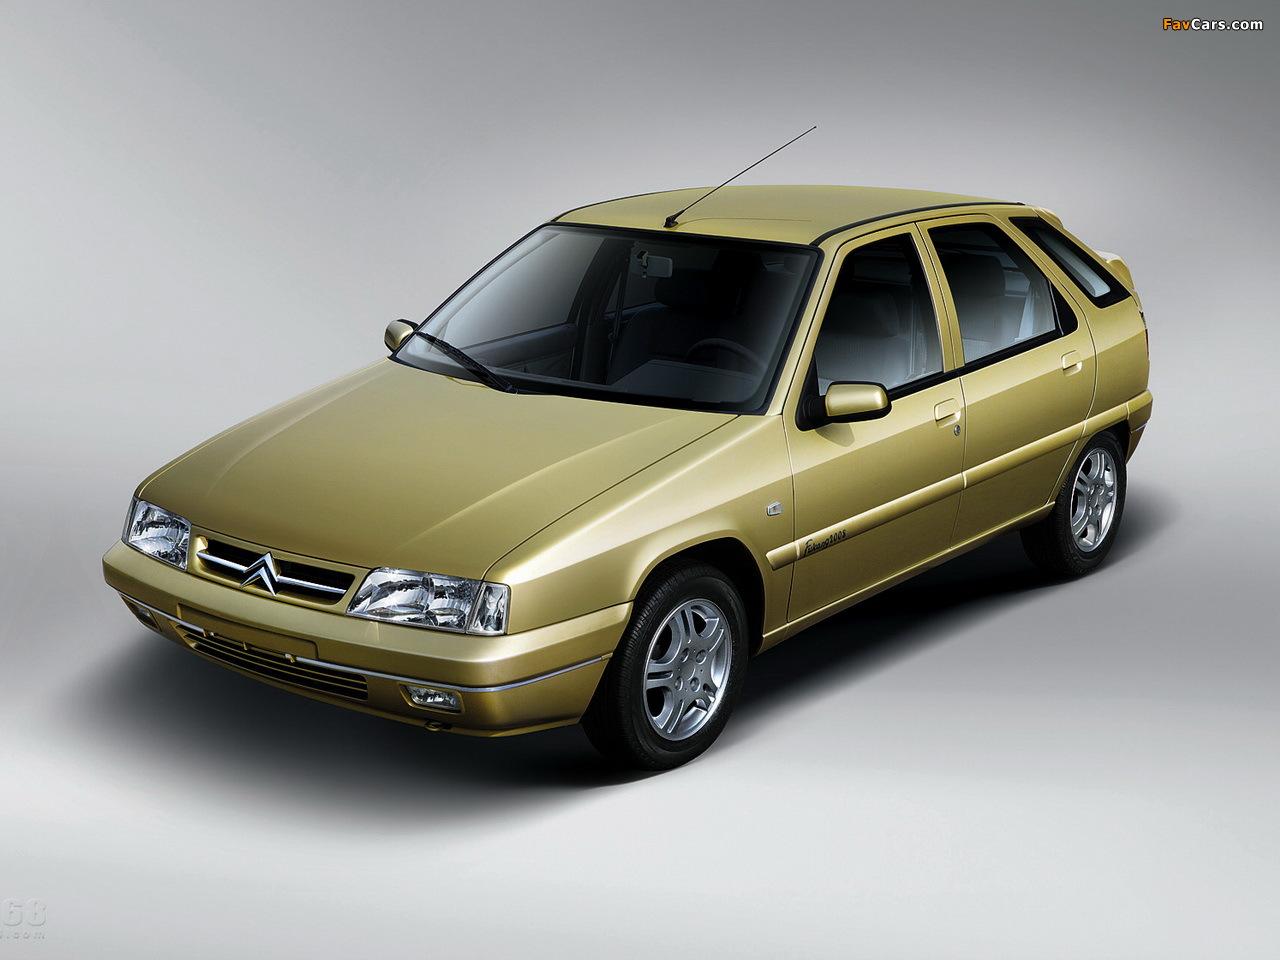 Citroën Fukang (DC7140) 1997–2009 pictures (1280 x 960)